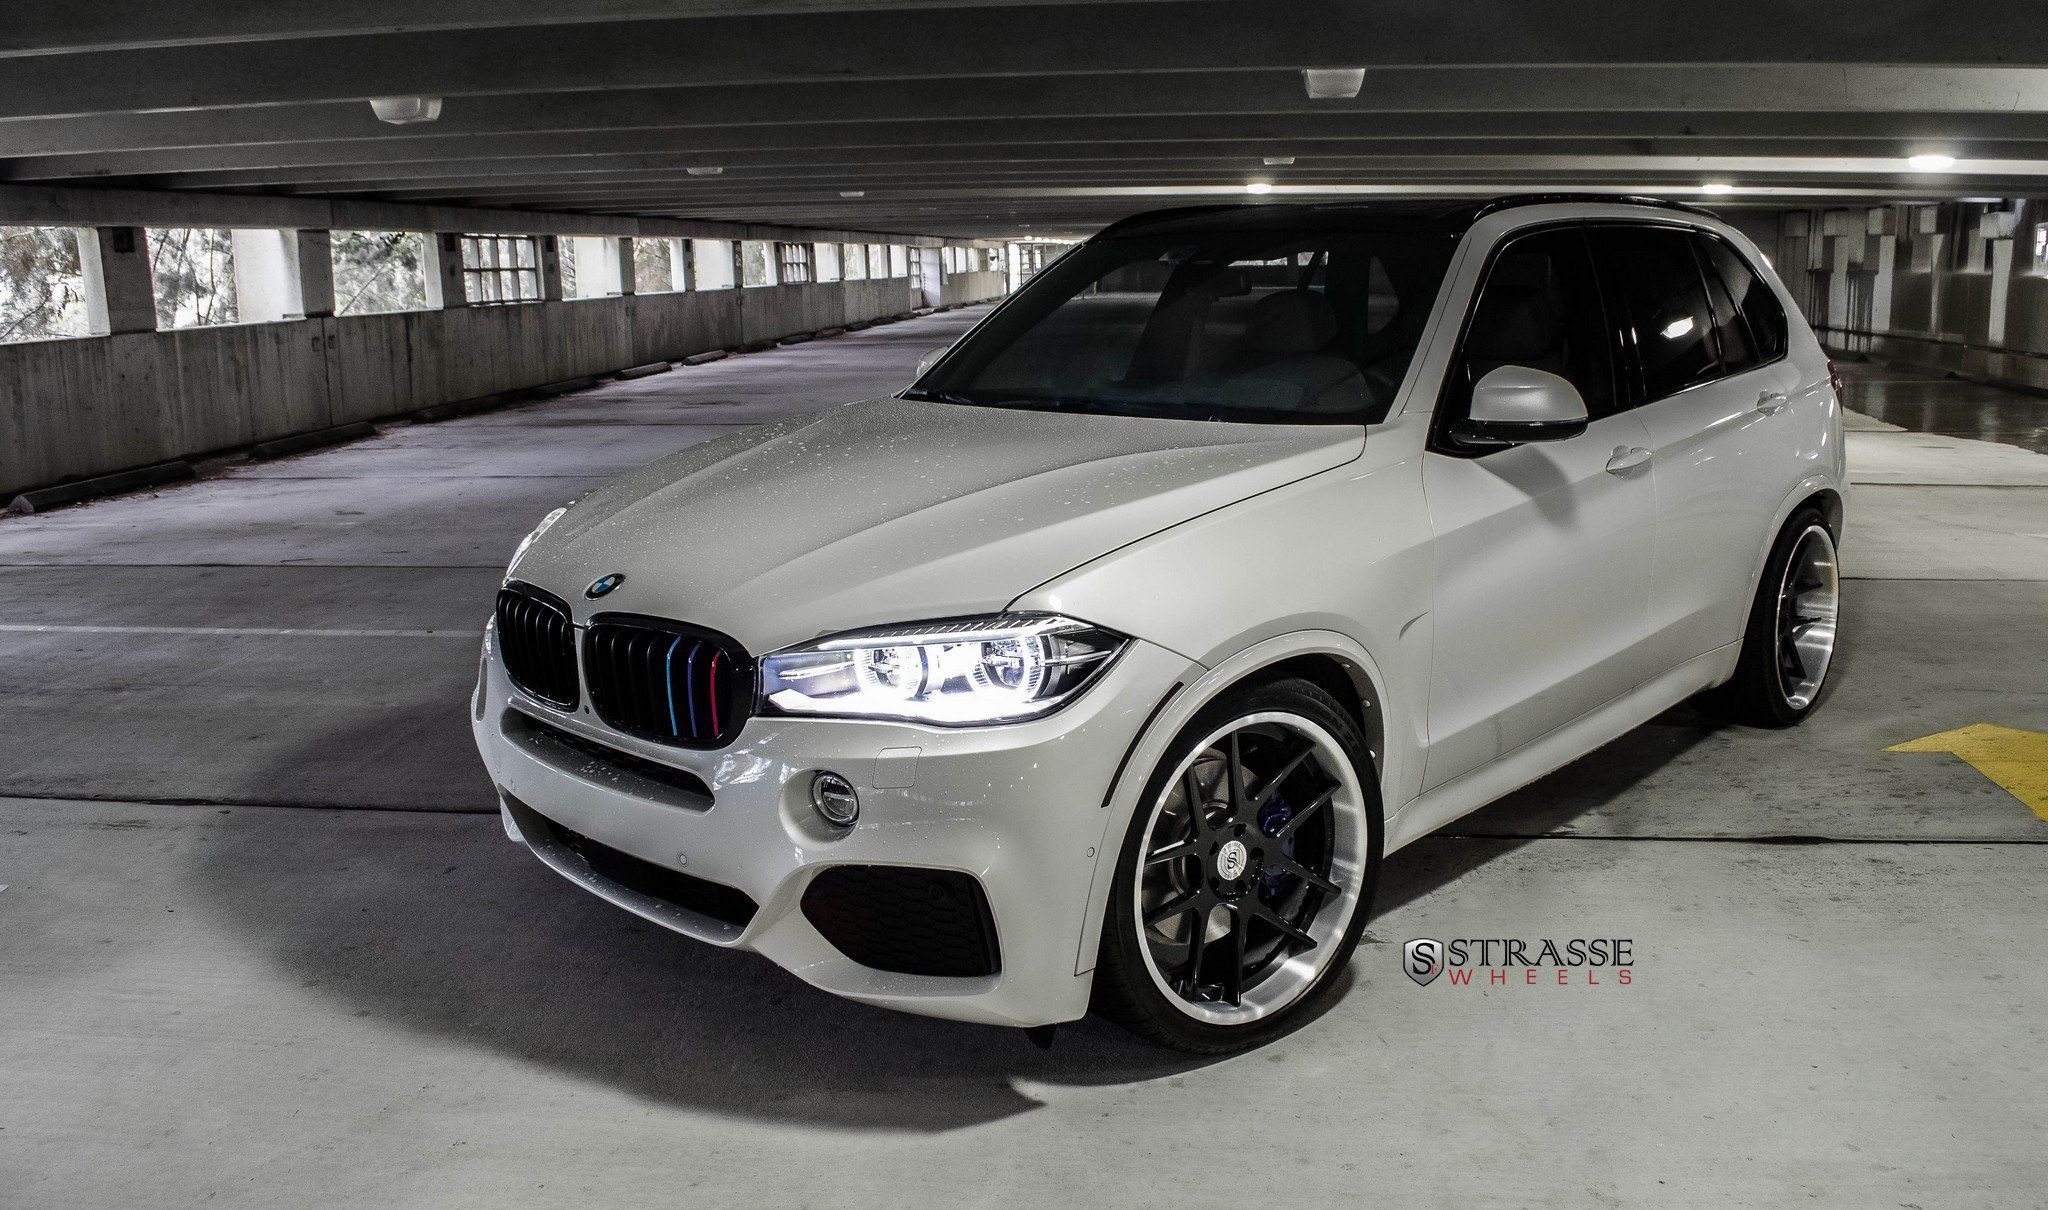 strasse-wheels-2015-bmw-x5-m-sport-g (2048×1210)   wheels